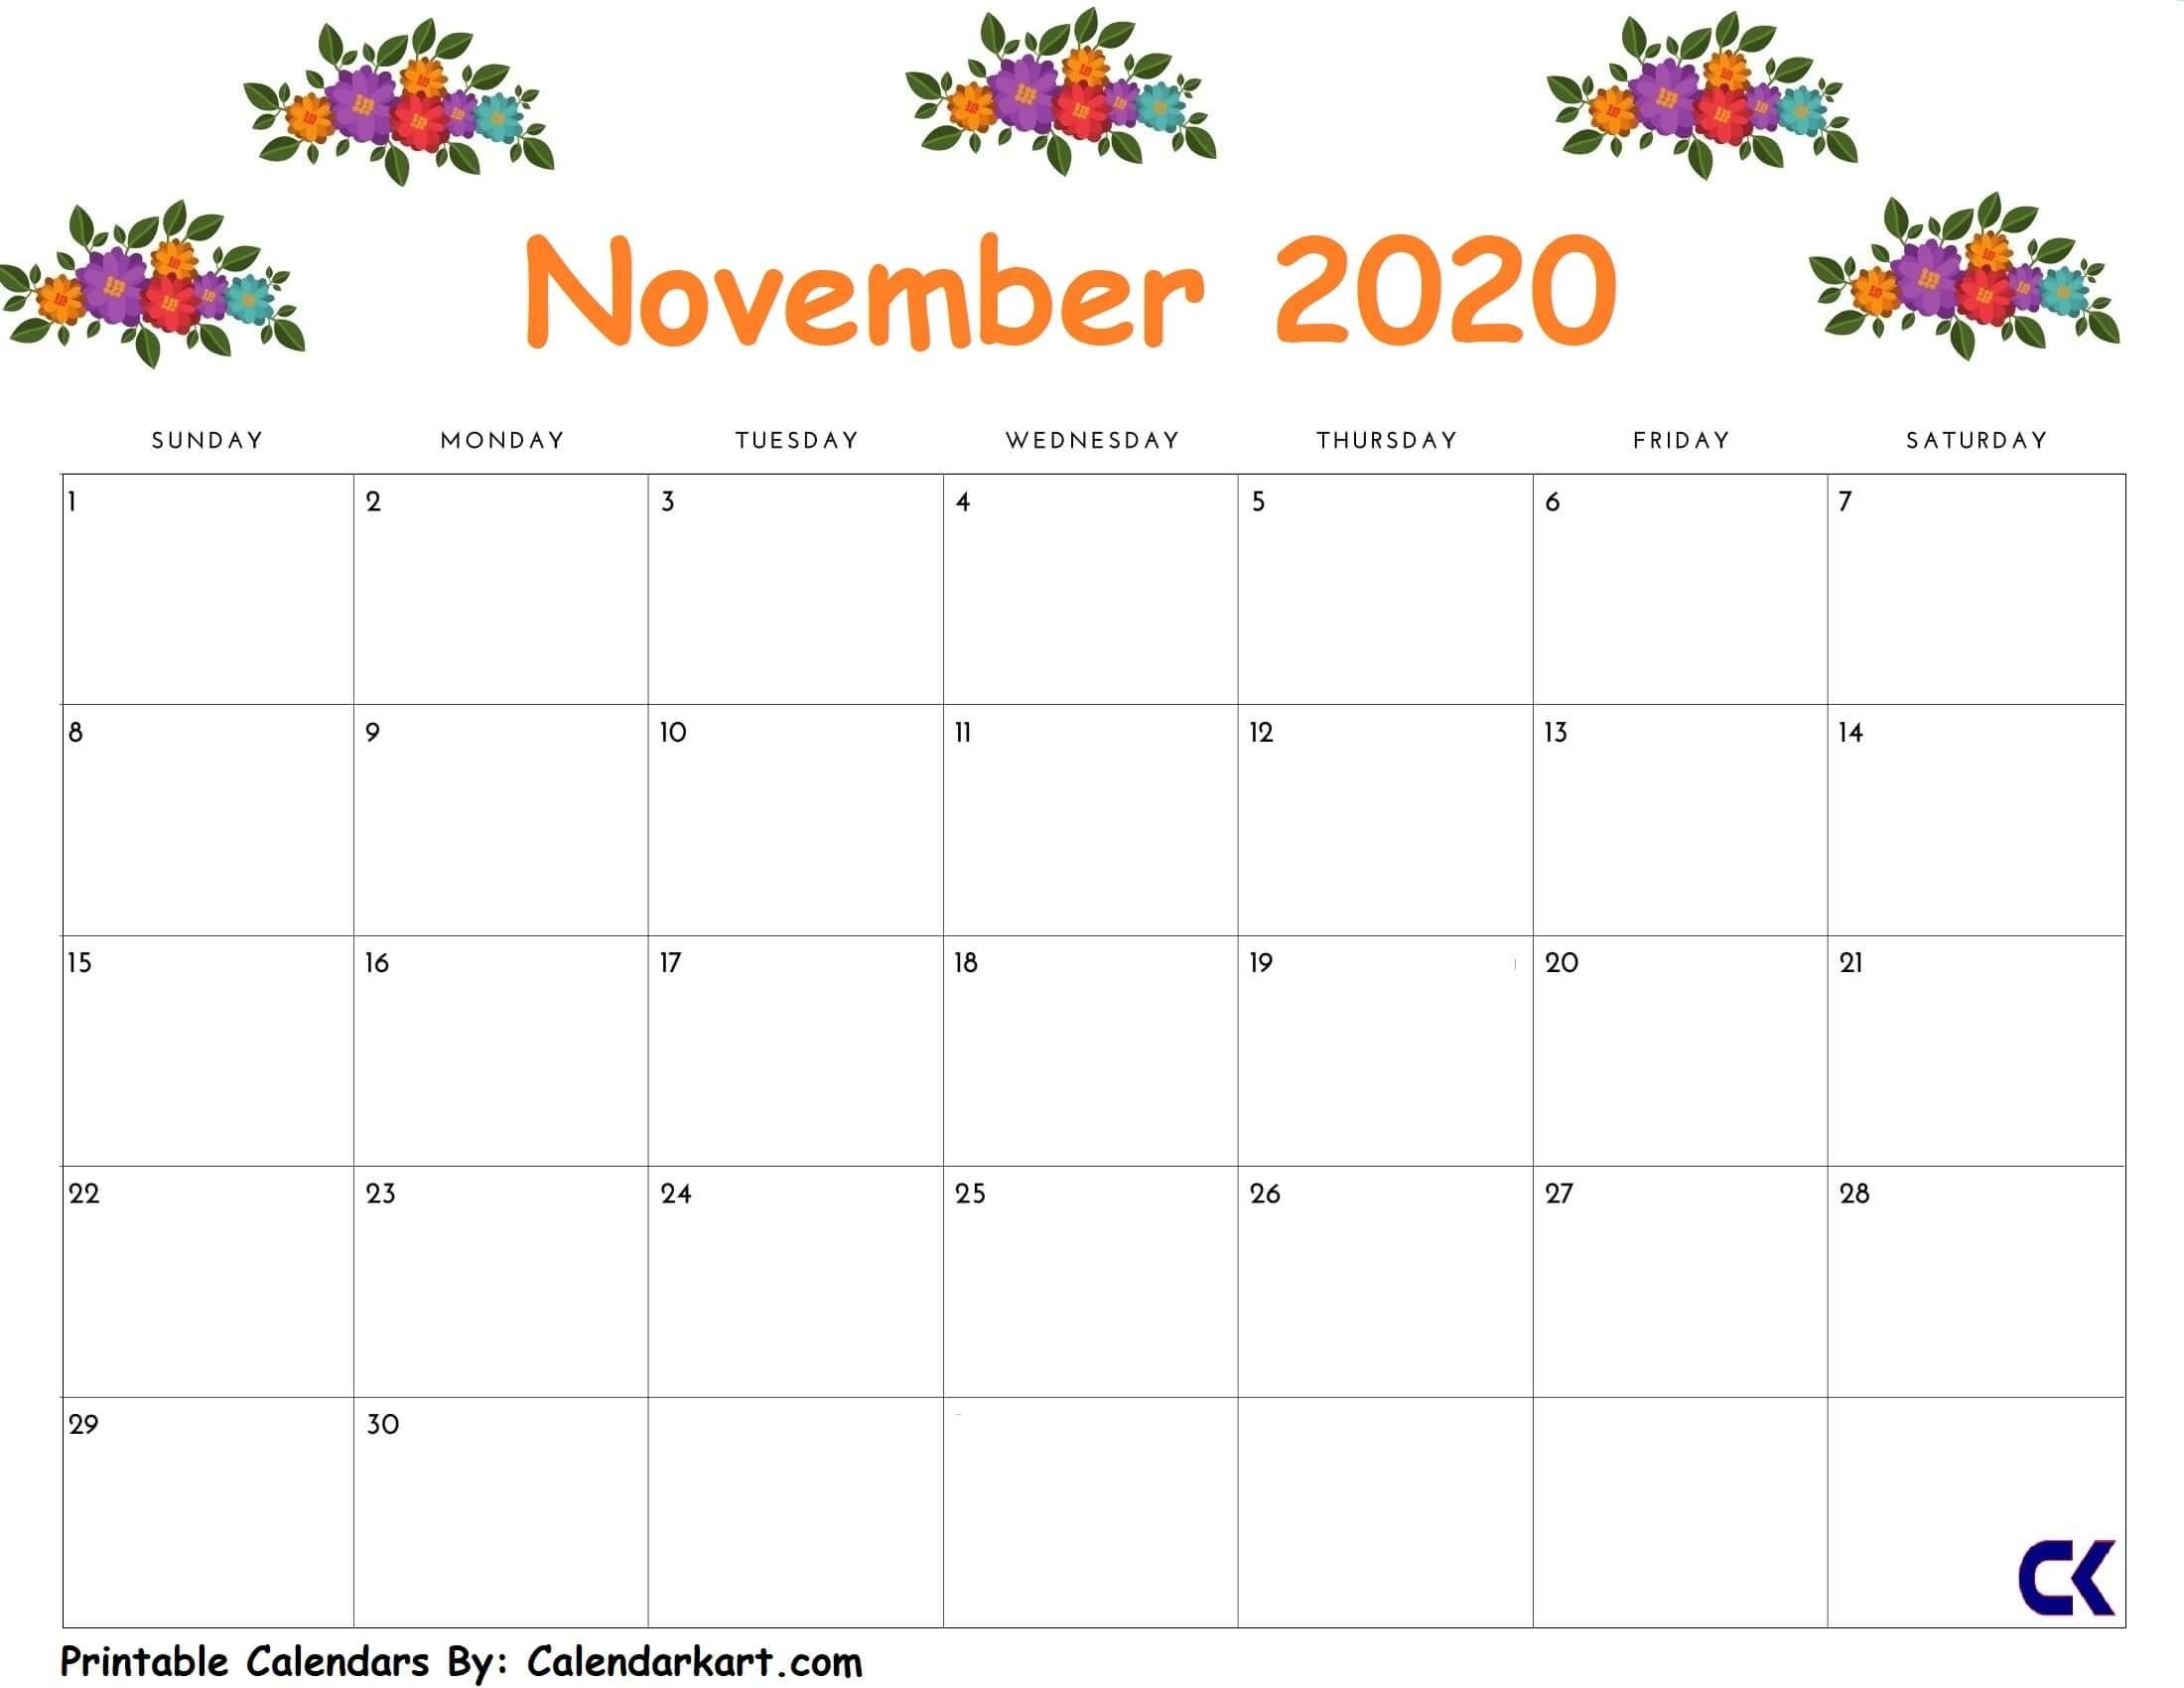 2019 November Calendar Printables | Teaching Resources November Calendar Template Kindergarten